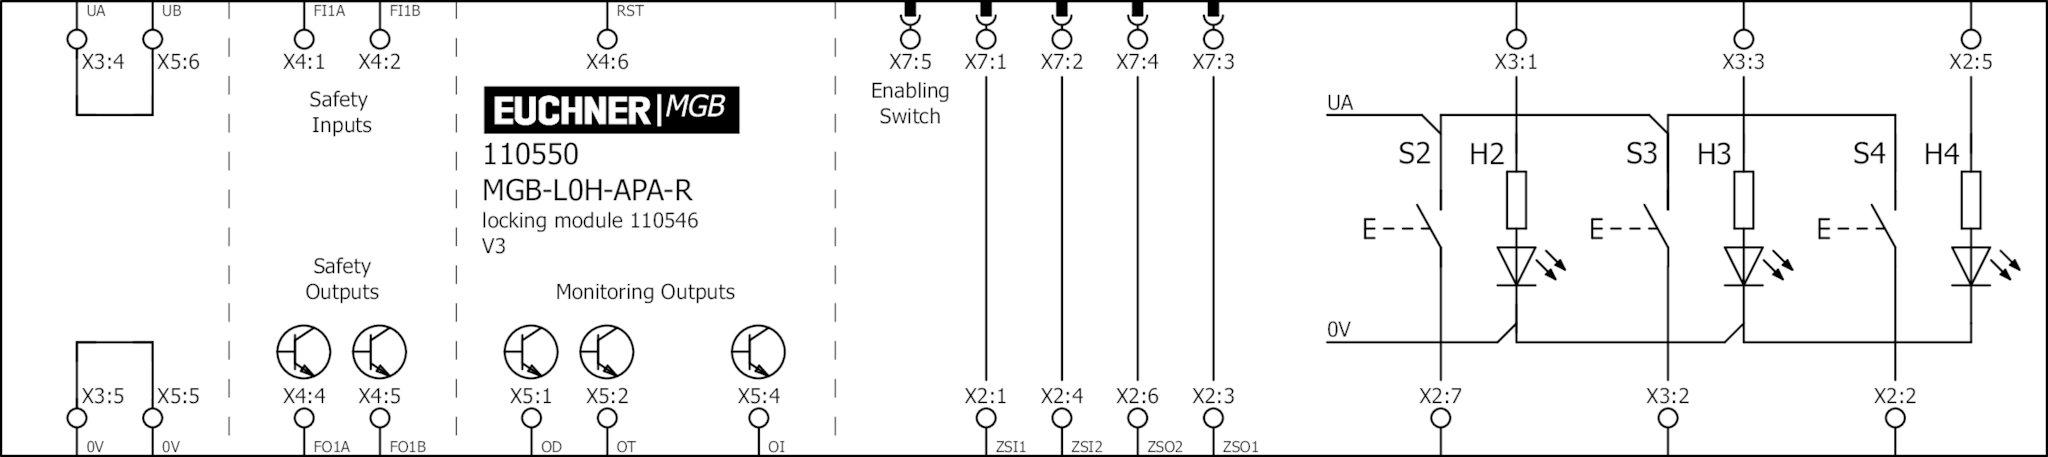 mgb wiring diagram symbols mgb l0h apa r 110550 interlocking set mgb l0h apa   with 3 push  mgb l0h apa r 110550 interlocking set